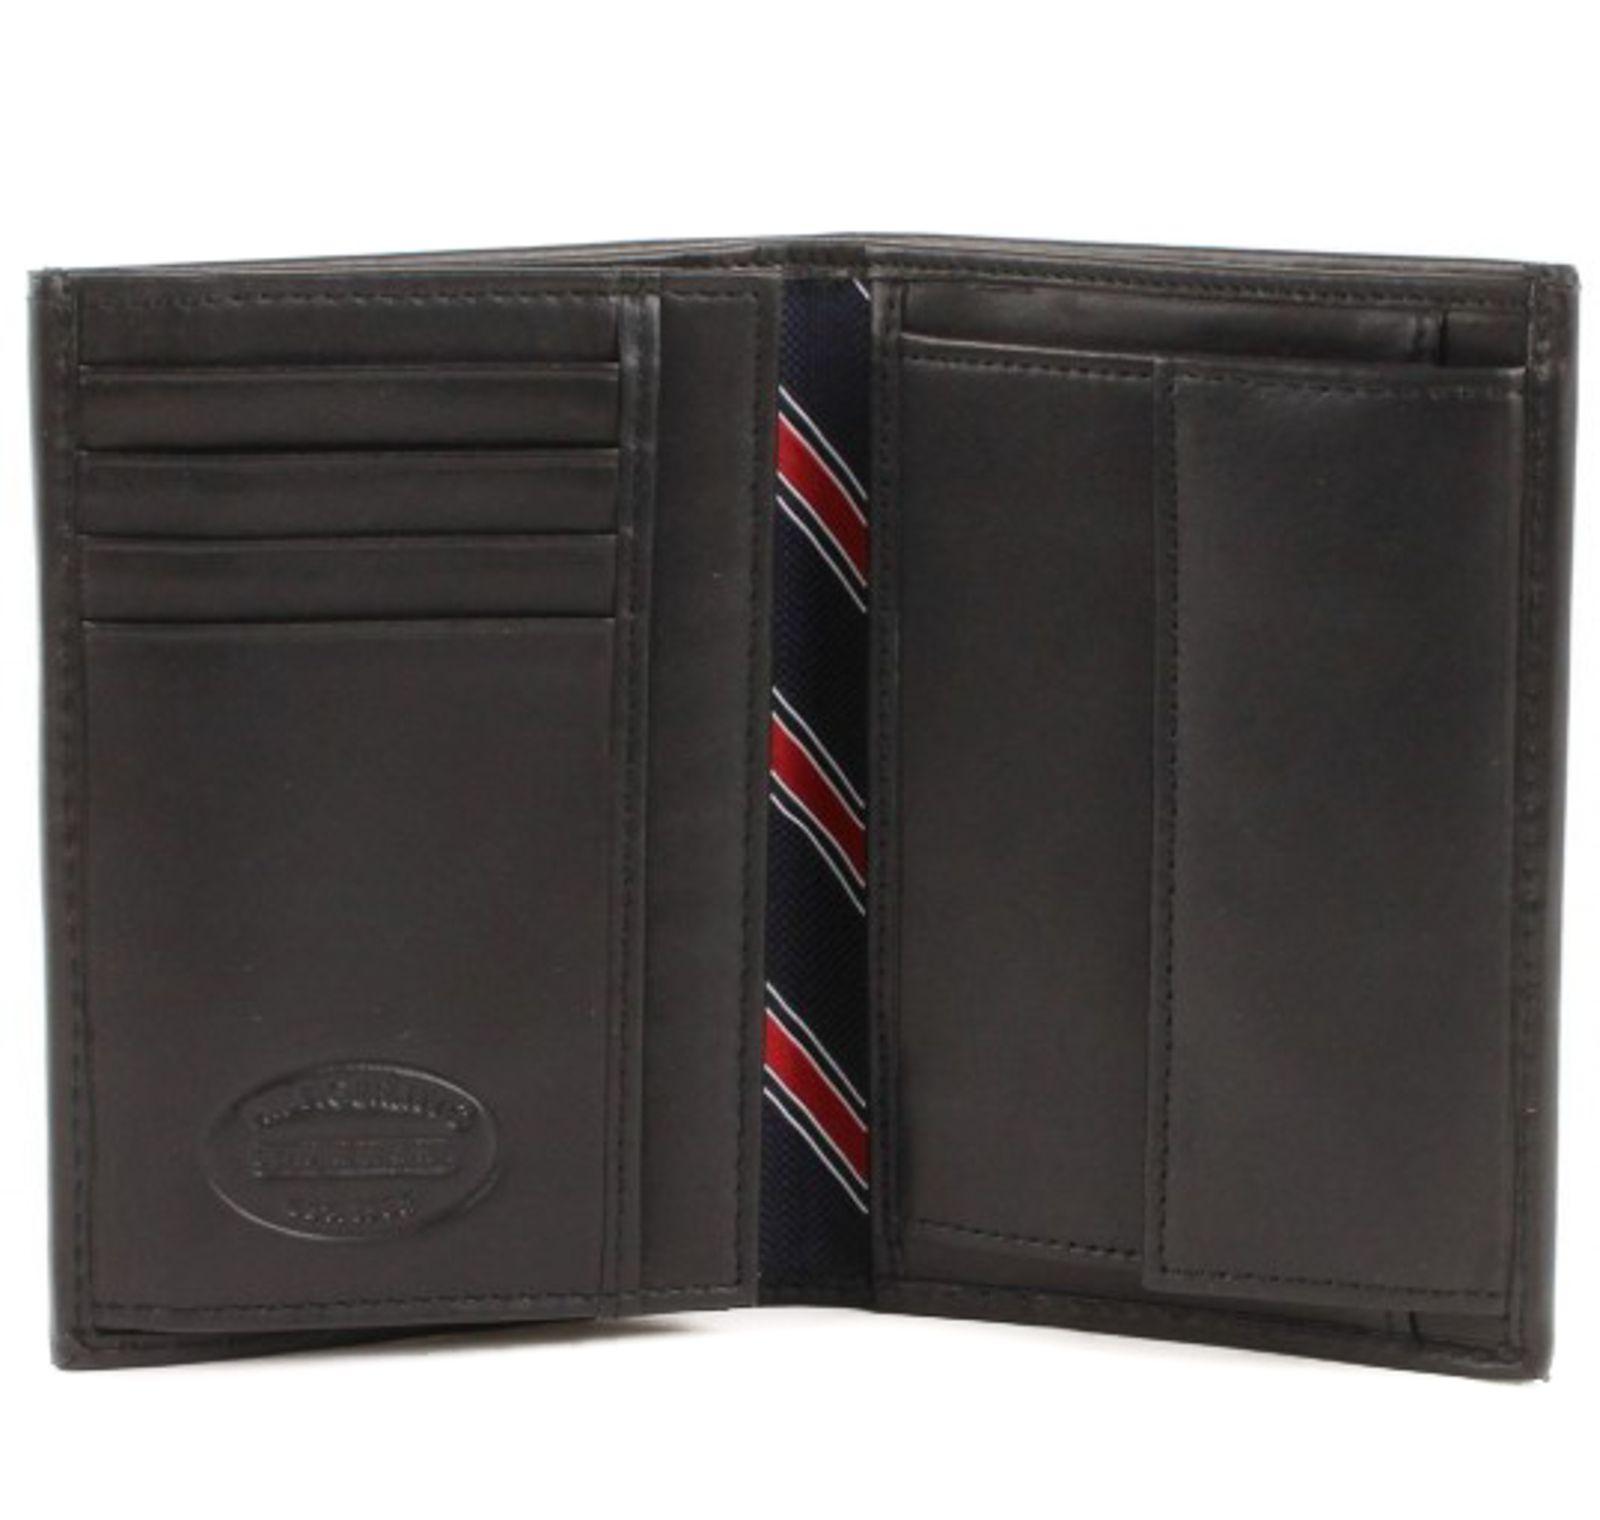 TOMMY HILFIGER Eton Wallet N / S with Coin Pocket Black